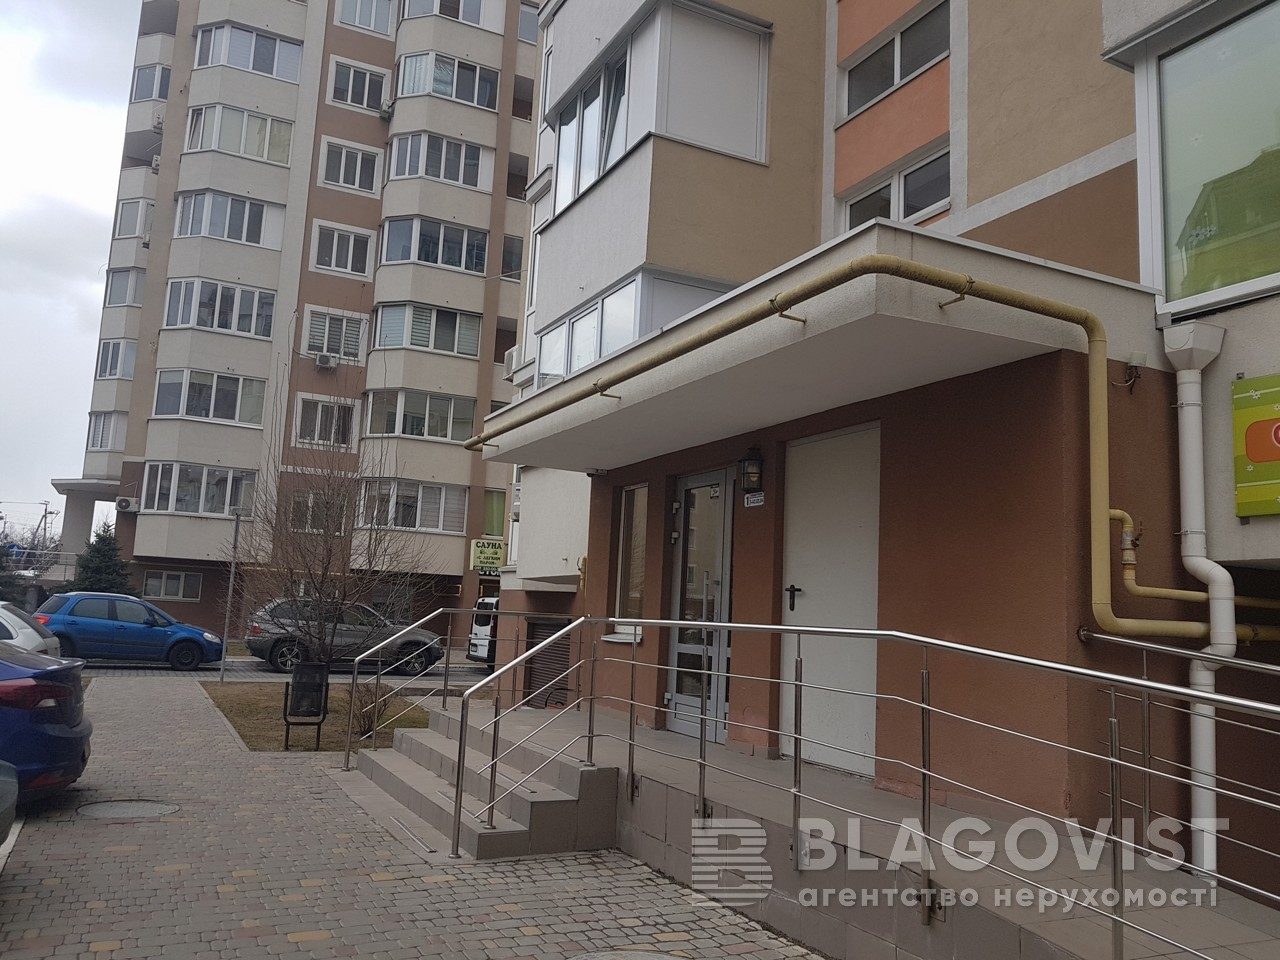 Квартира E-40784, Леси Украинки, 4, Софиевская Борщаговка - Фото 42